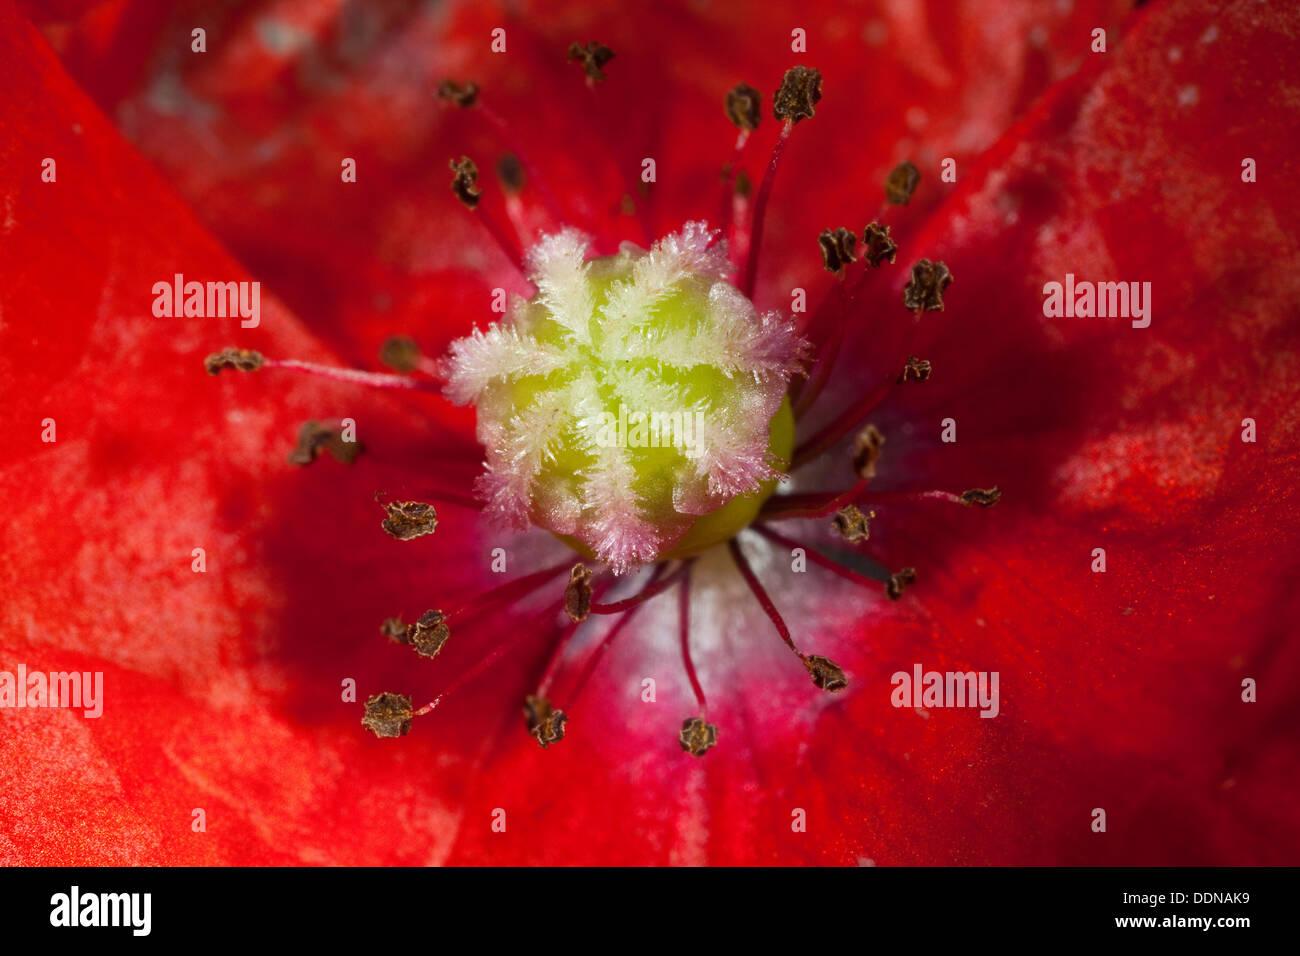 Poppy, bloom, blossom, Mohn, Blüte mit Stempel, Narbe, Fruchtknoten und Staubbeuteln, Blütenaufbau, Blütenökologie, Stock Photo